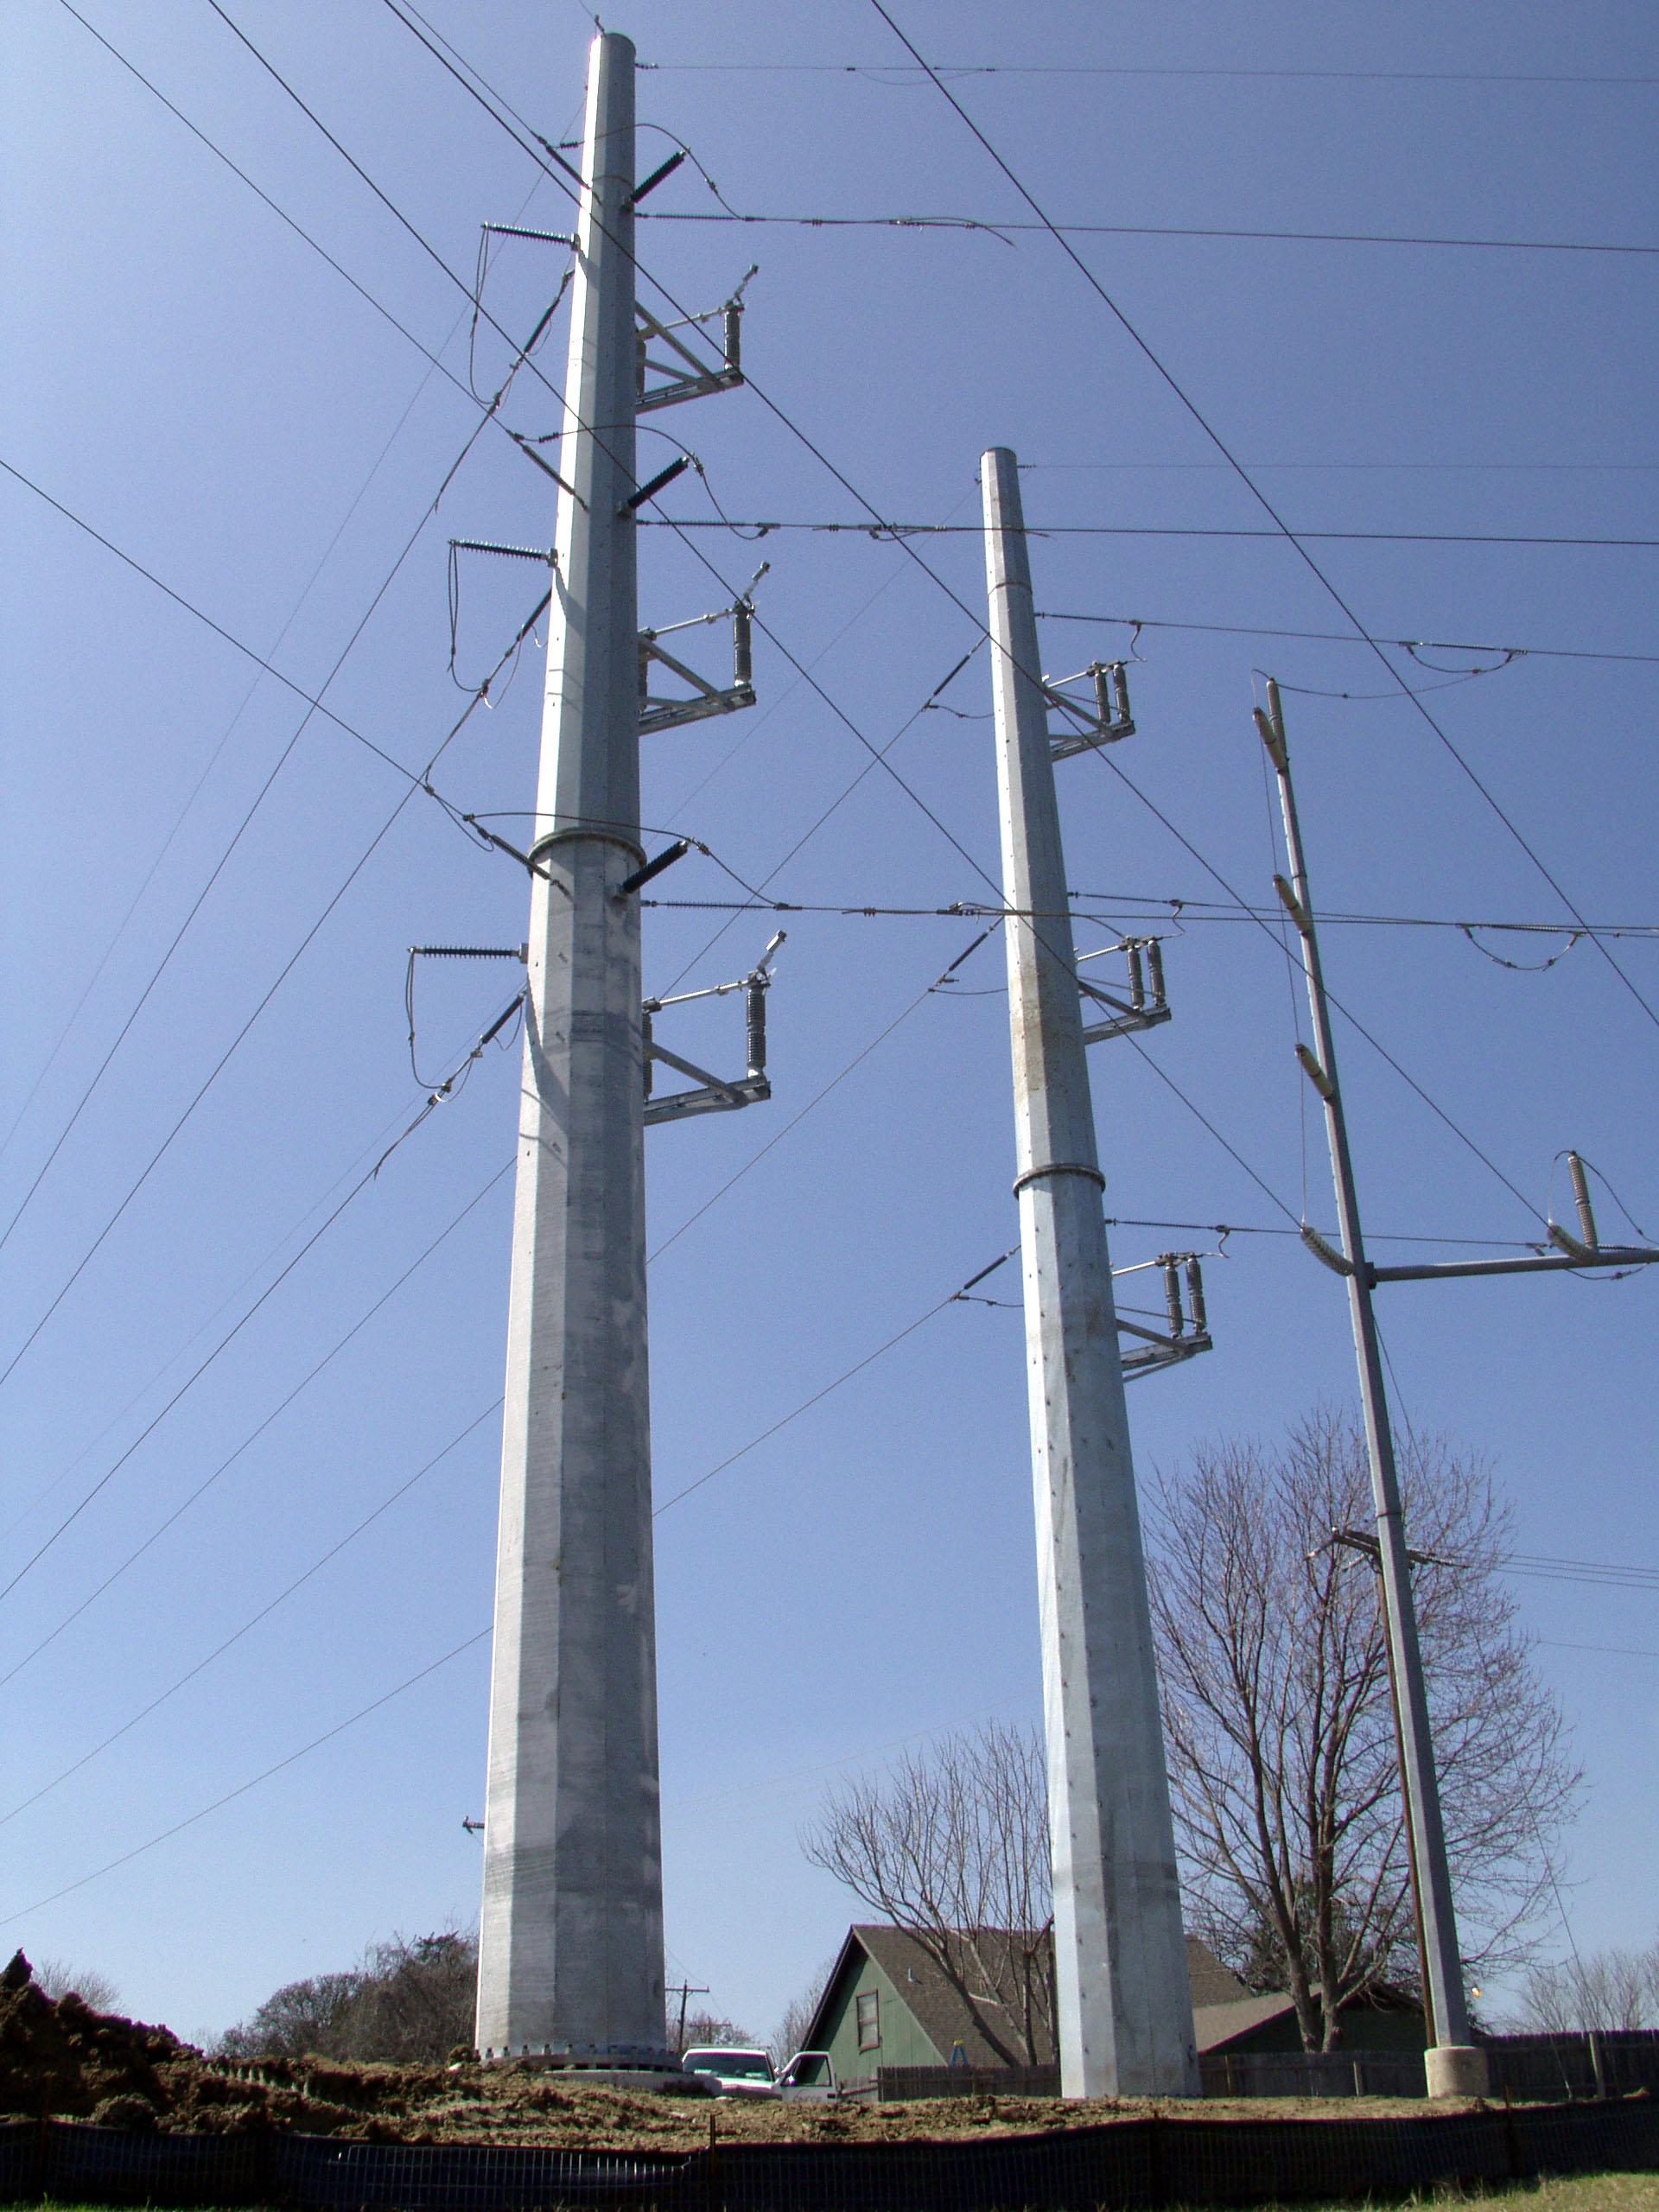 Free photo: Metal Power Pole - Electric, Feed, Fuse - Free Download - Jooinn